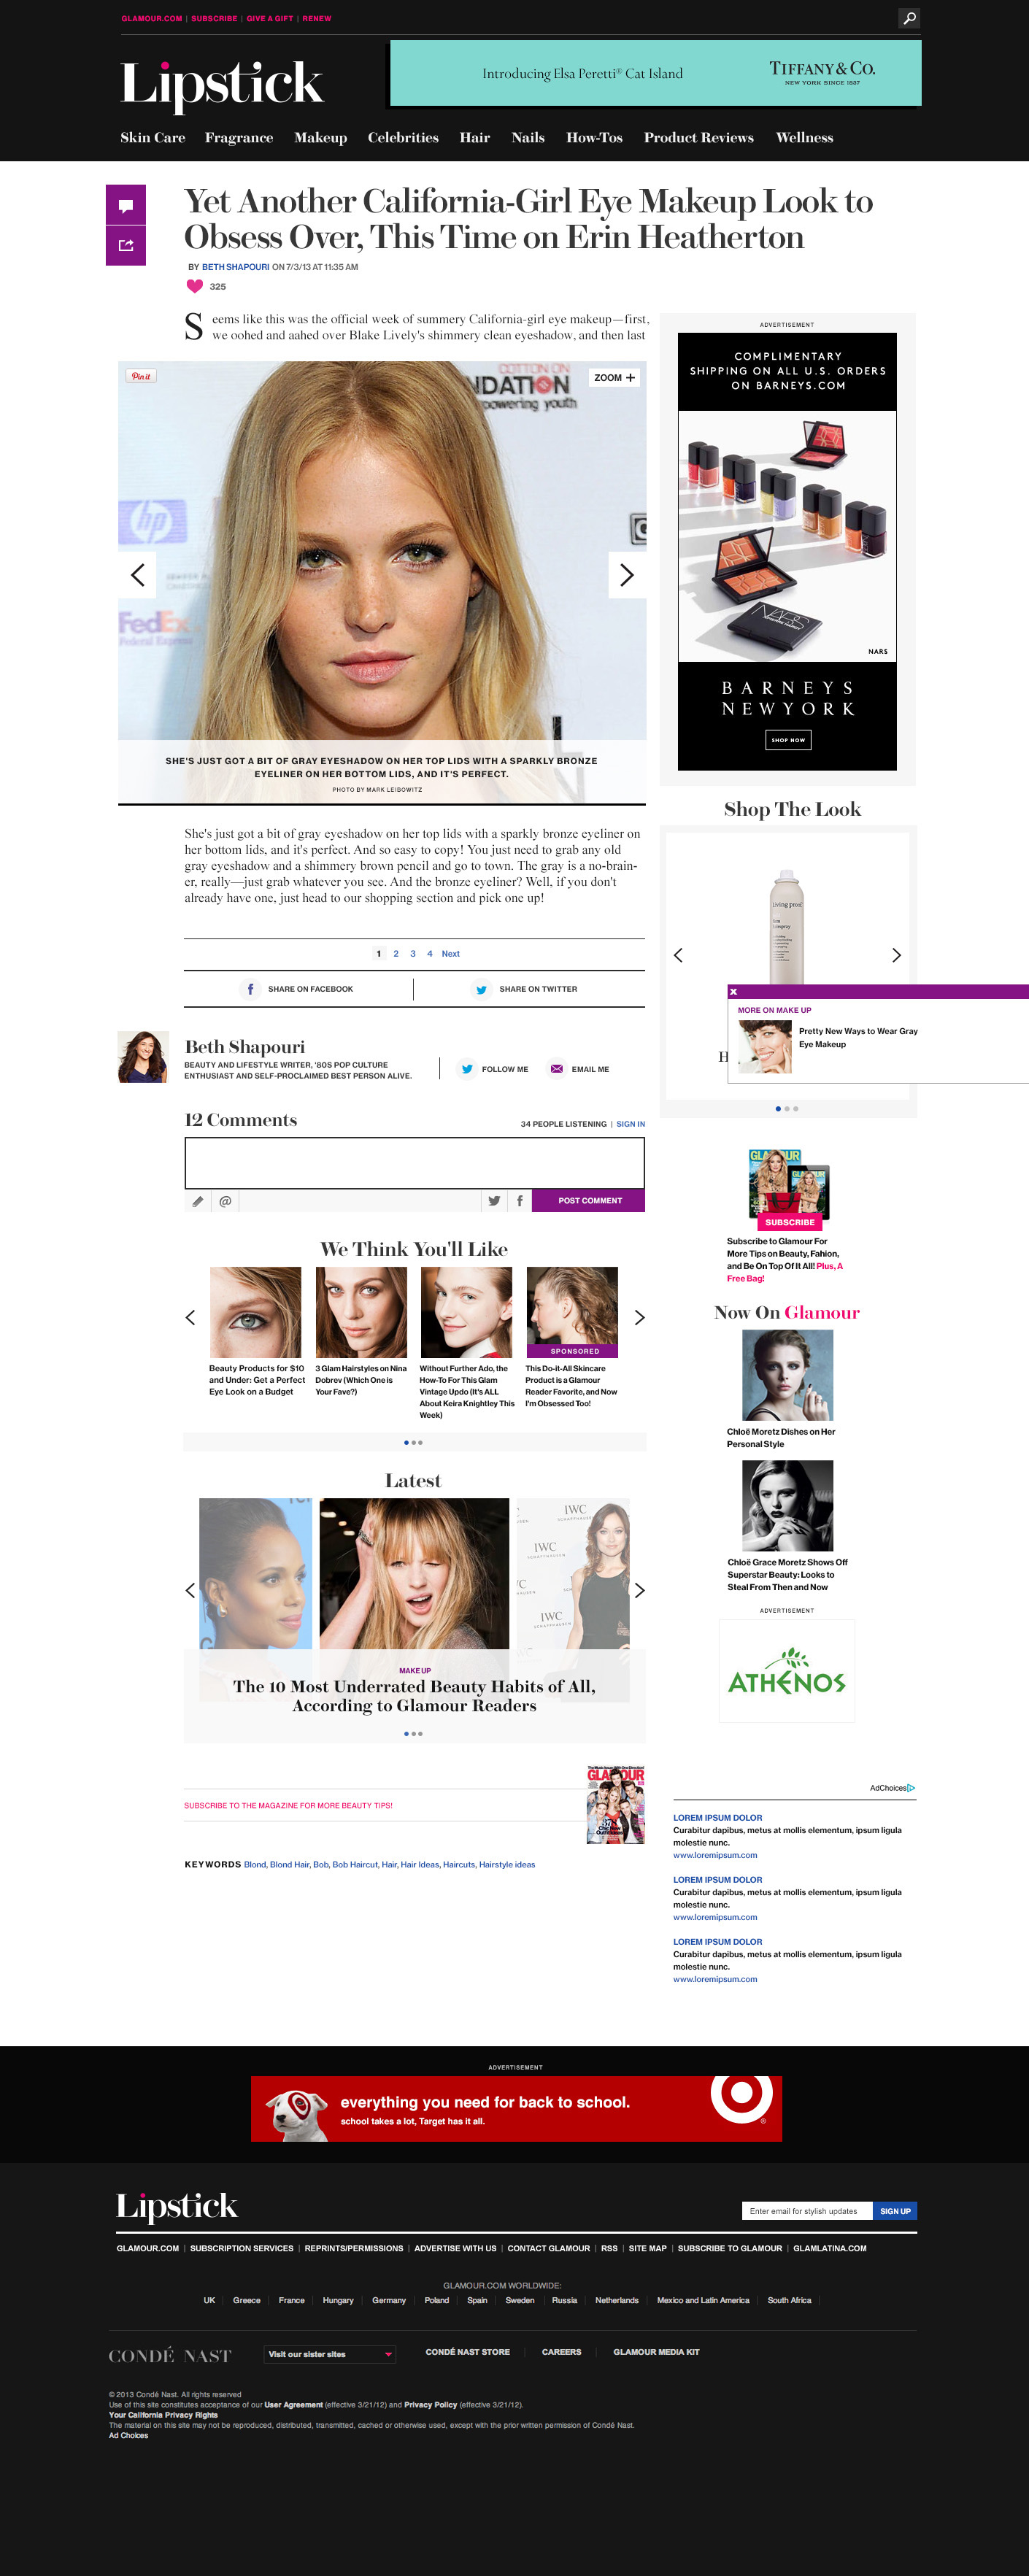 Lipstick_UX_Article_default_1104.jpg